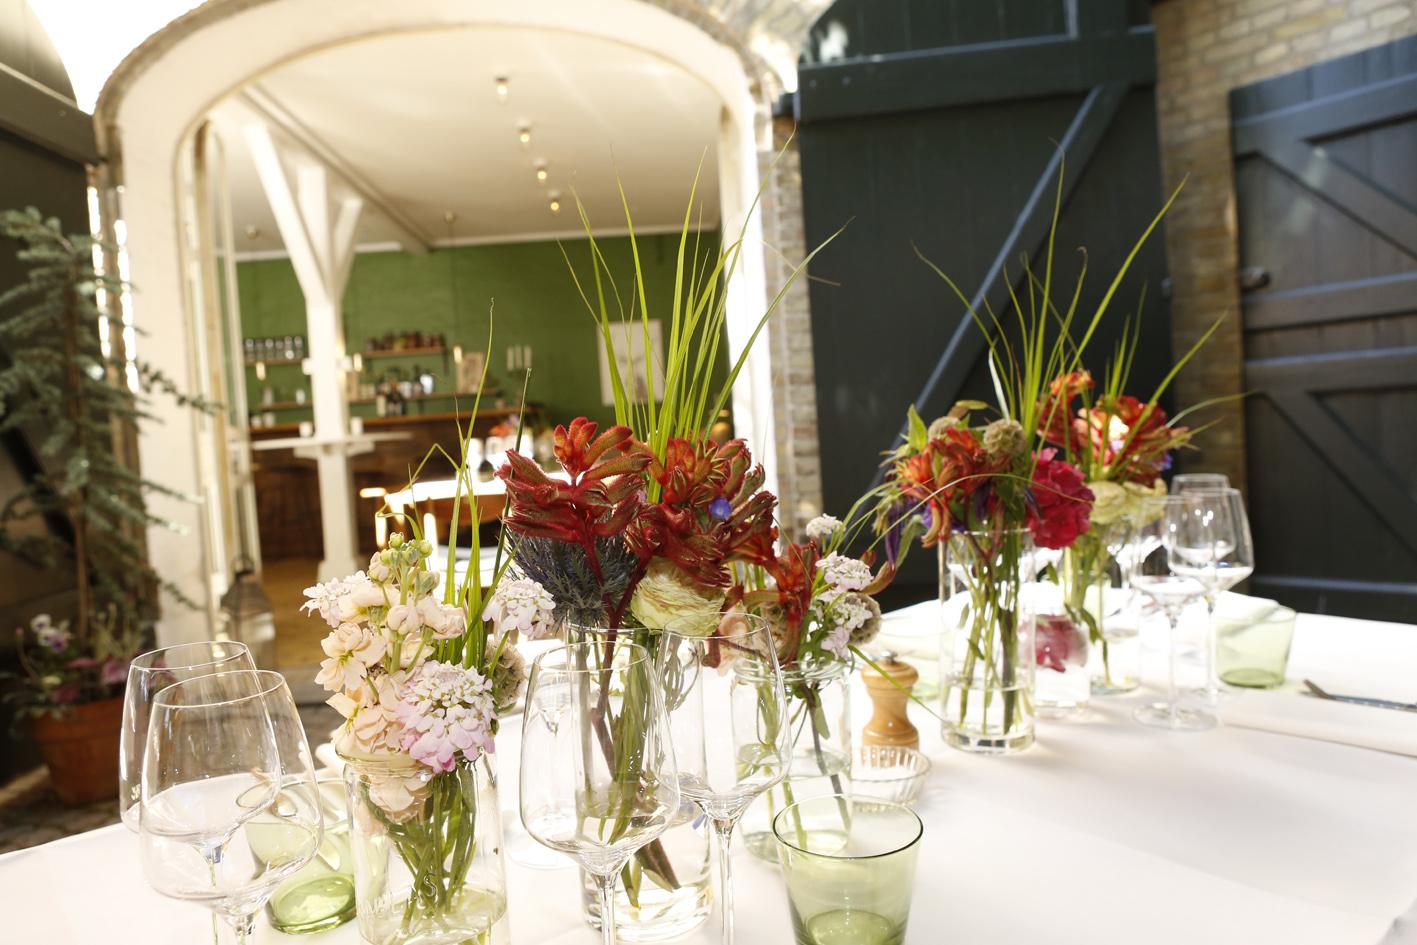 Blomster Og Dekorationer Til Din Sommerfest